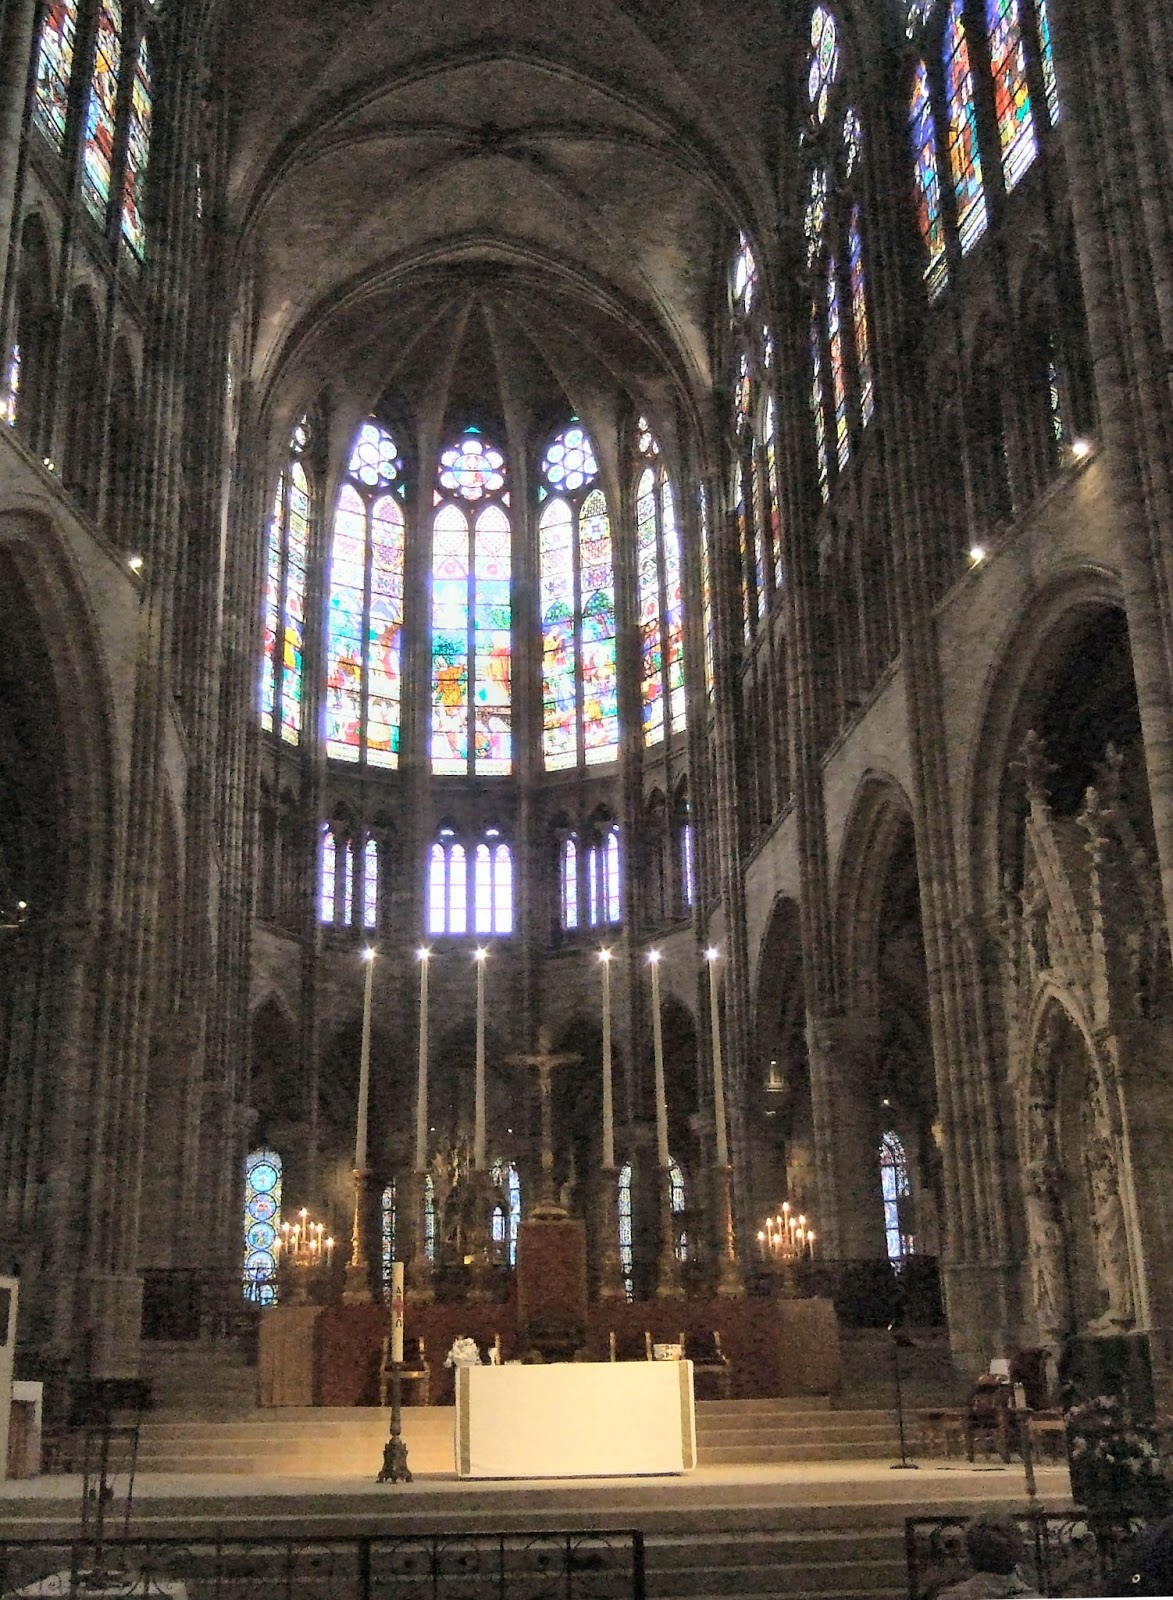 Abbey of Saint-Denis (Paris). Basilica of Saint-Denis. Sights of France 52